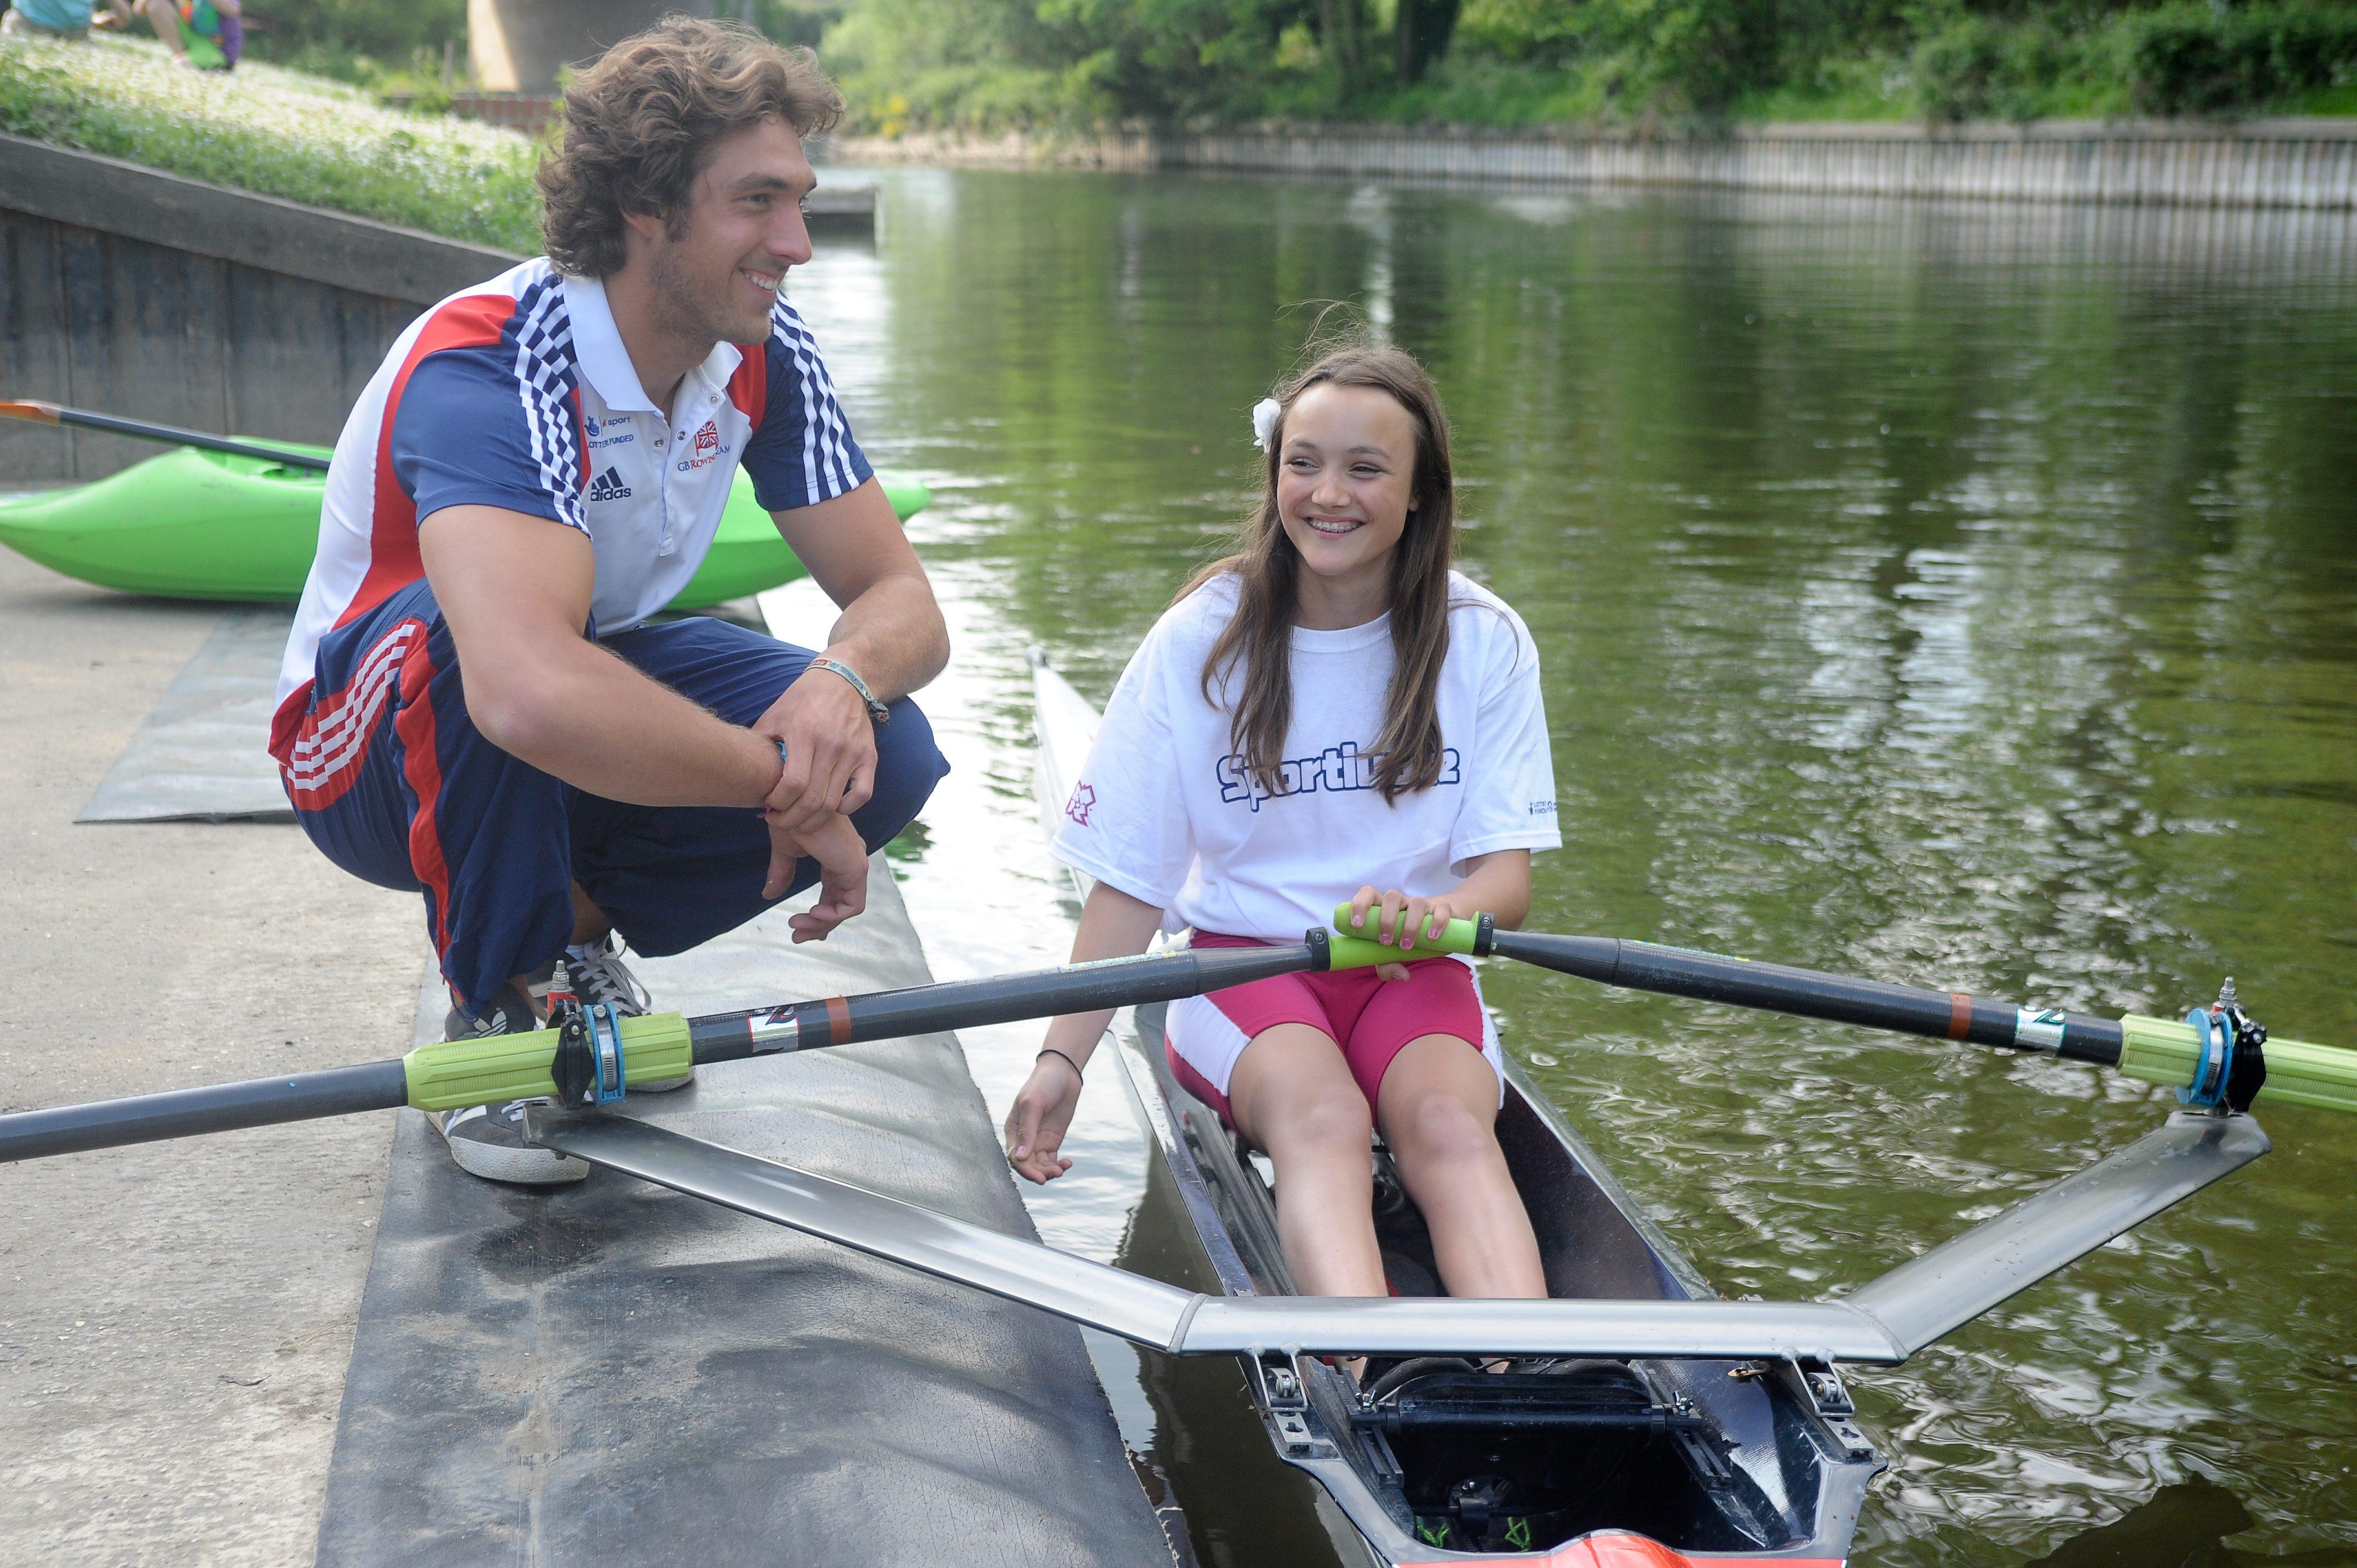 Sporting Champion Charles Cousins talks to Georgina Napier-Munn and shares tatics at Sport England at Longridge Activity Cente